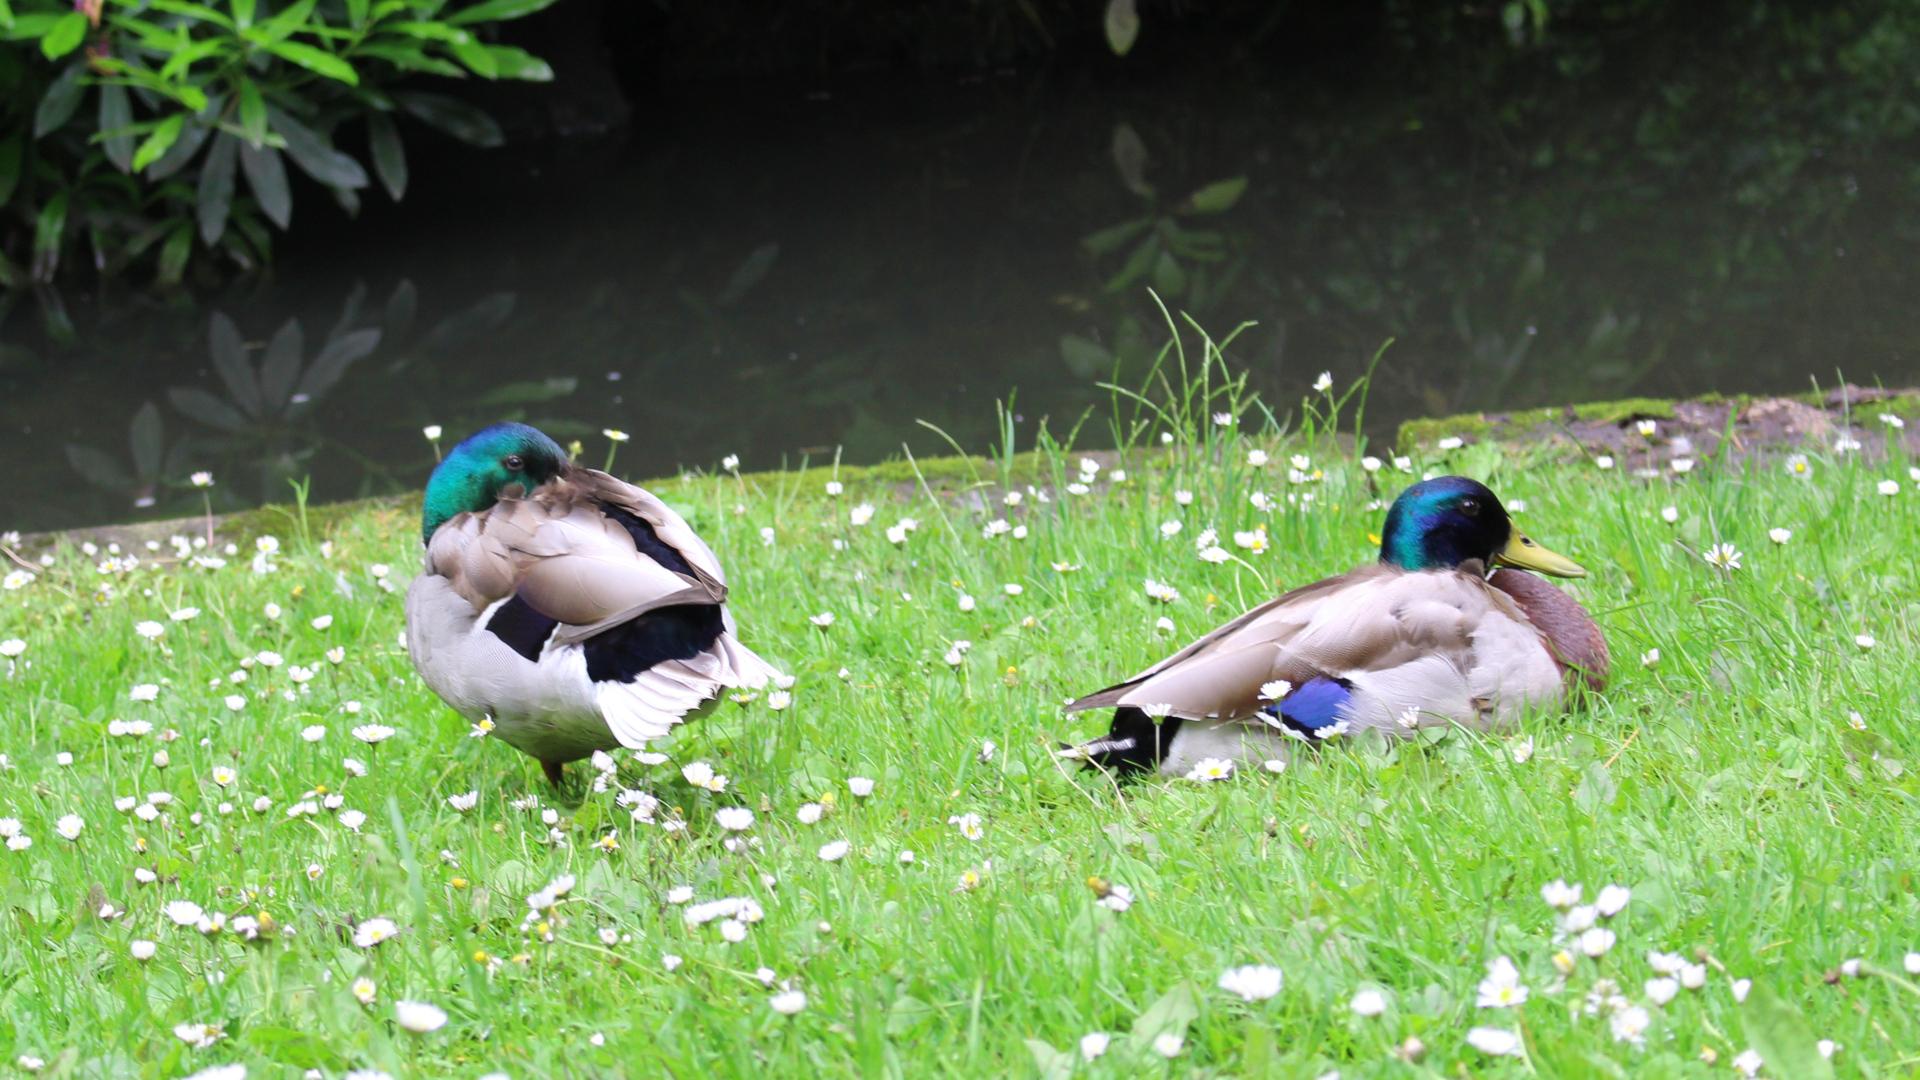 Mallards by Greenbank Park Lake by Lauren Day Saunders